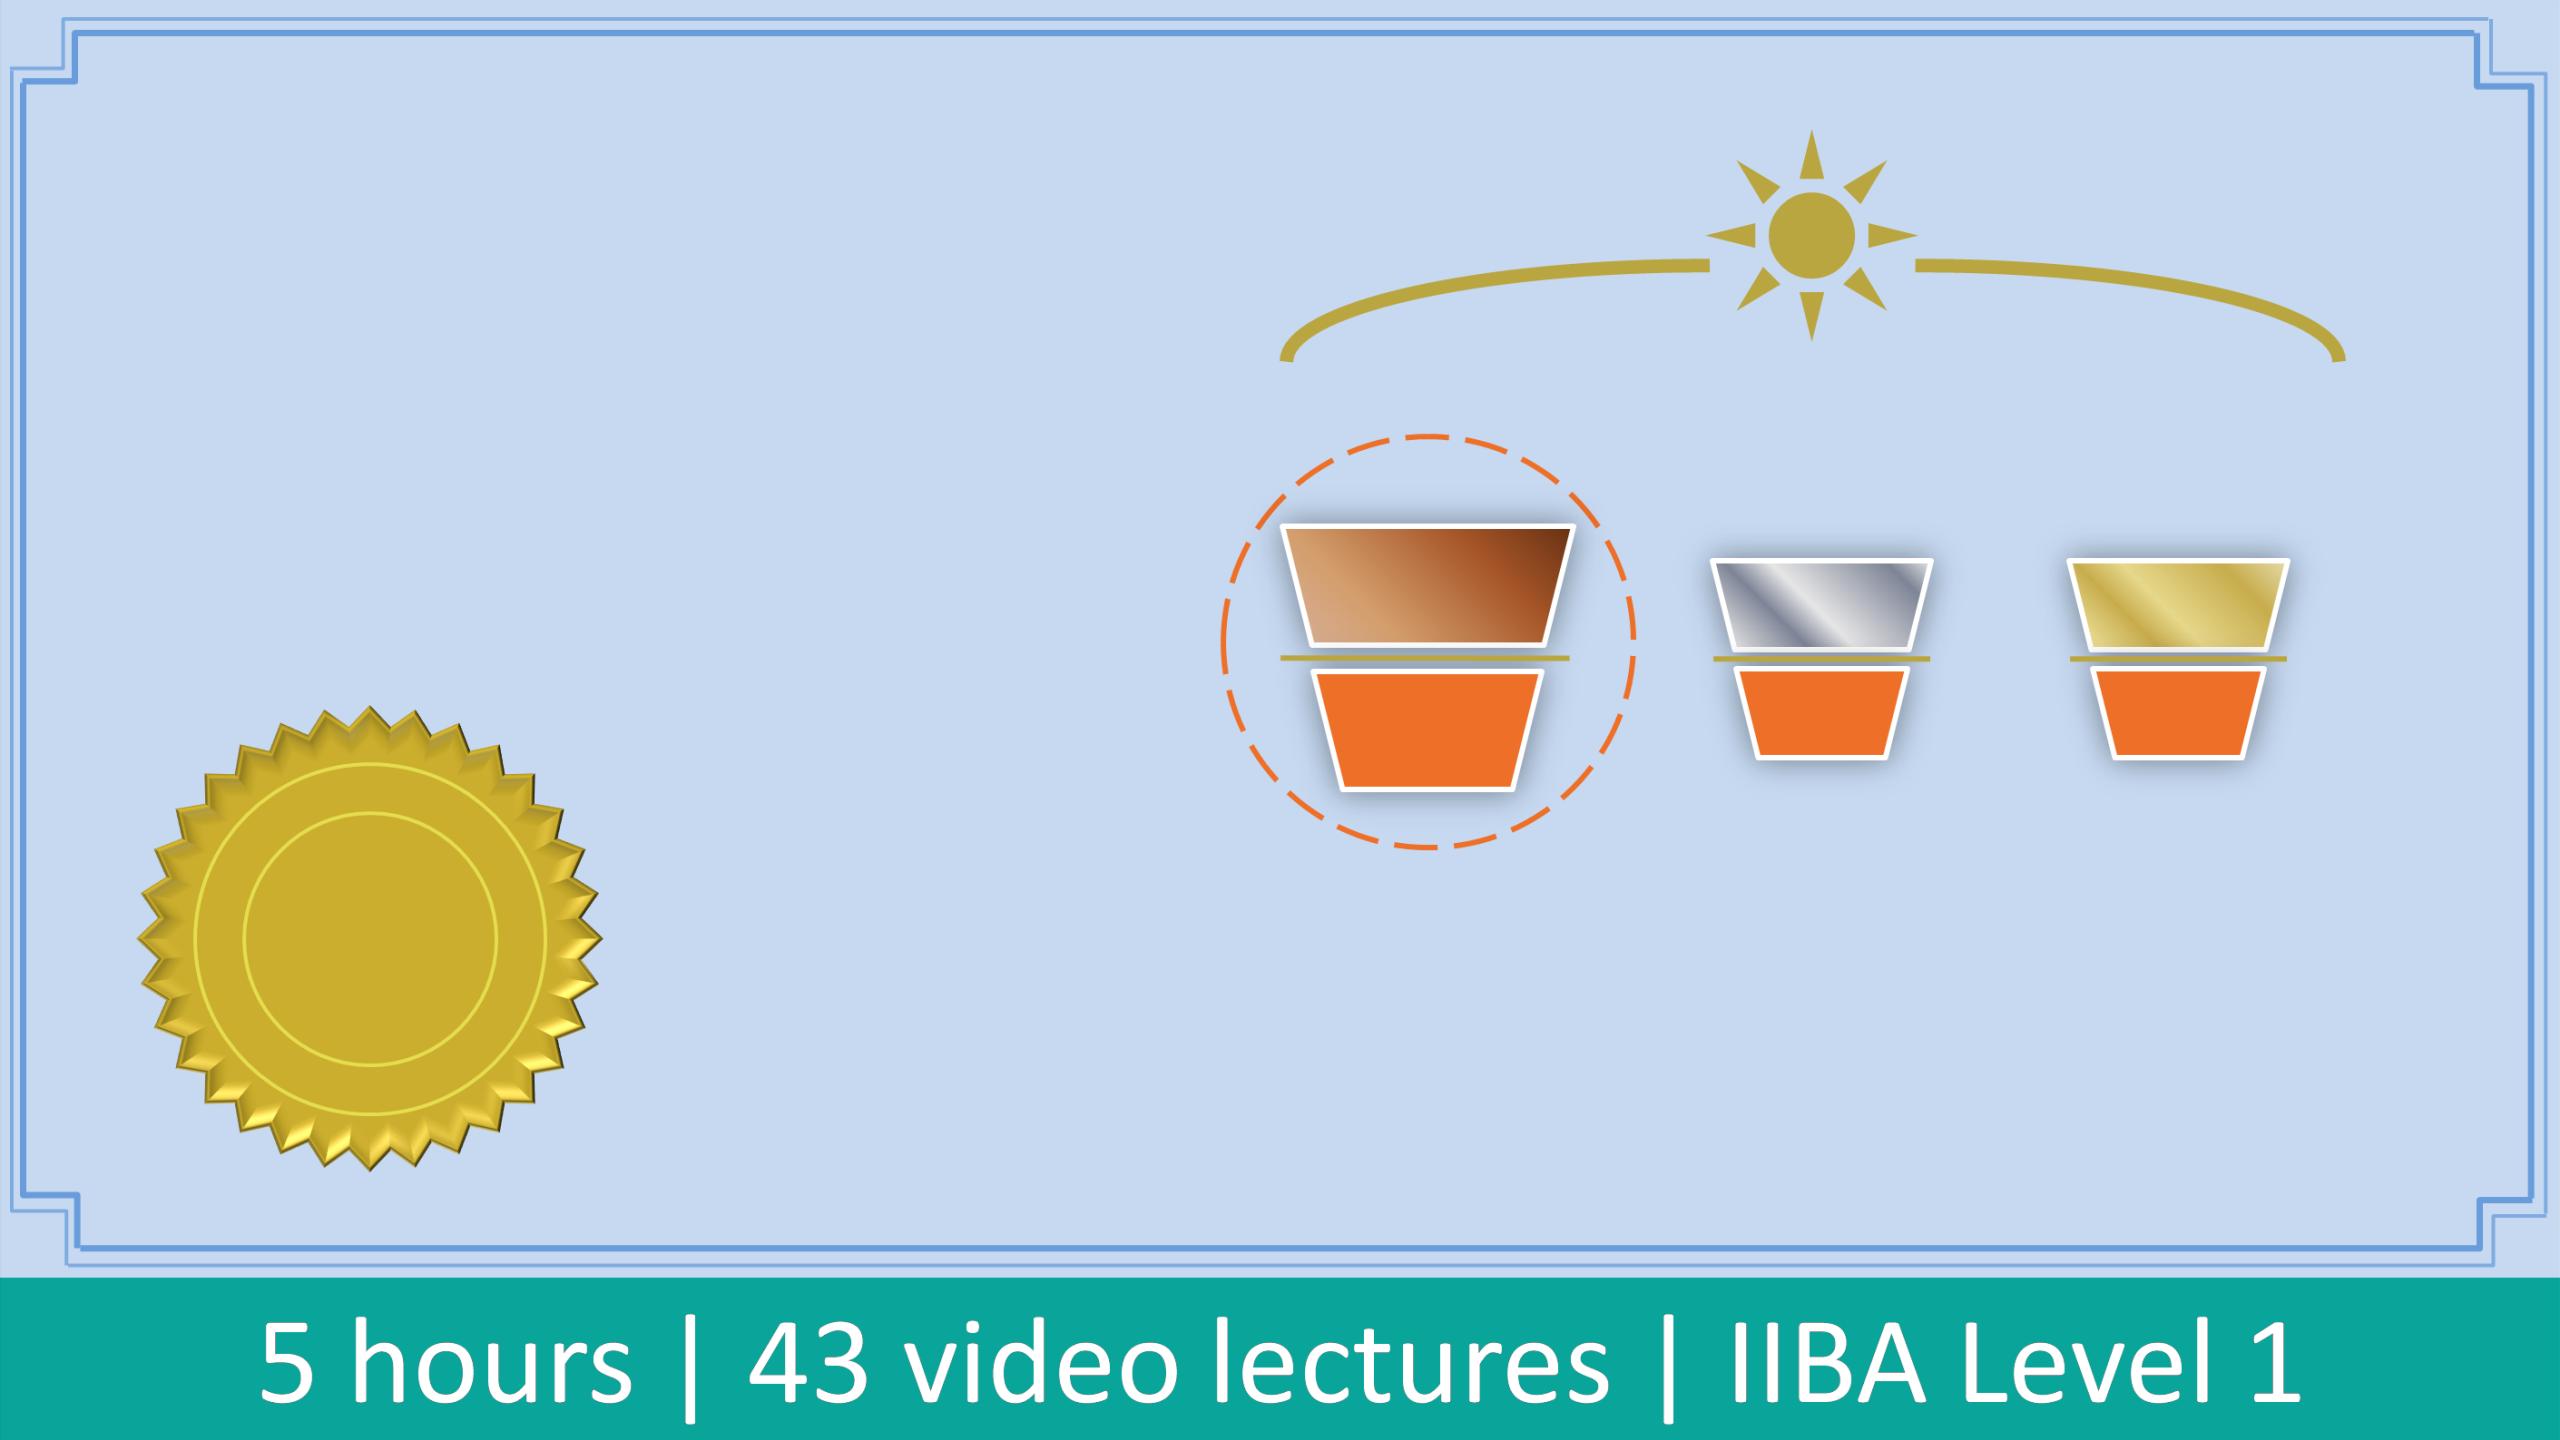 IIBA Entry Certificate in Business Analysis (ECBA) Course